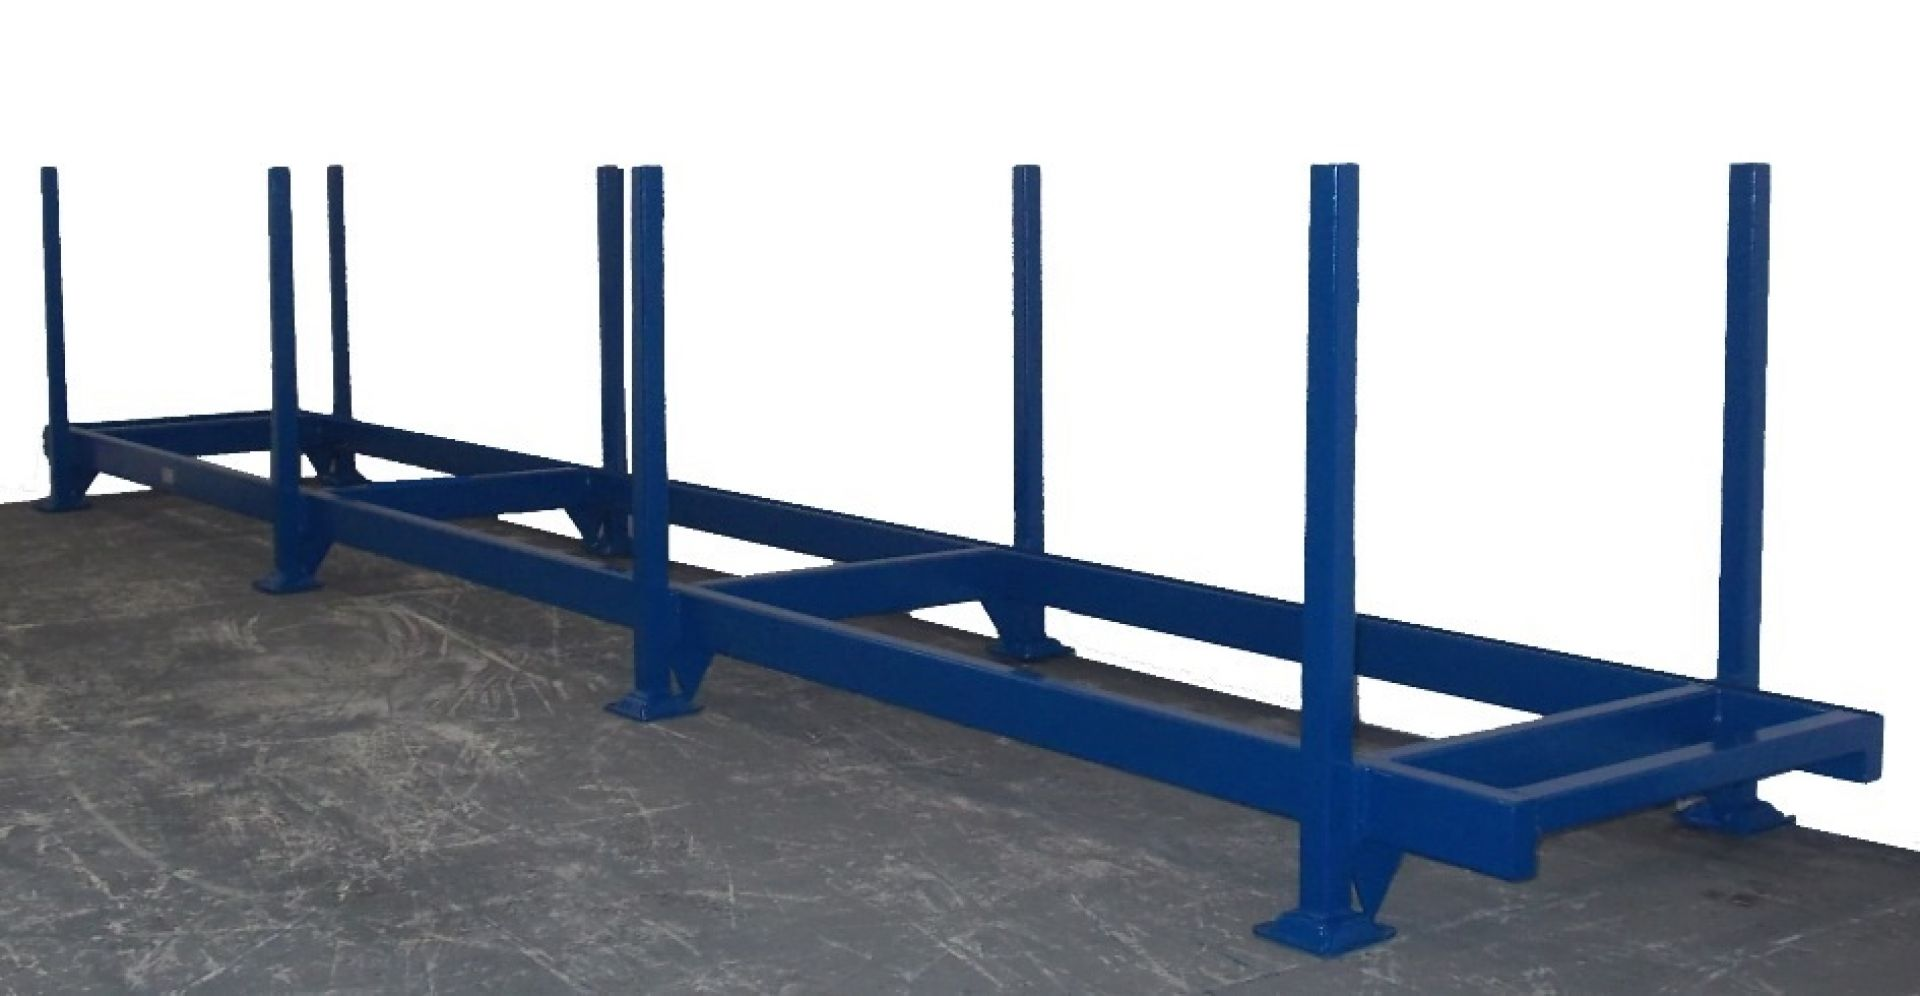 Langgutpalette 4,5 m blau lackiert